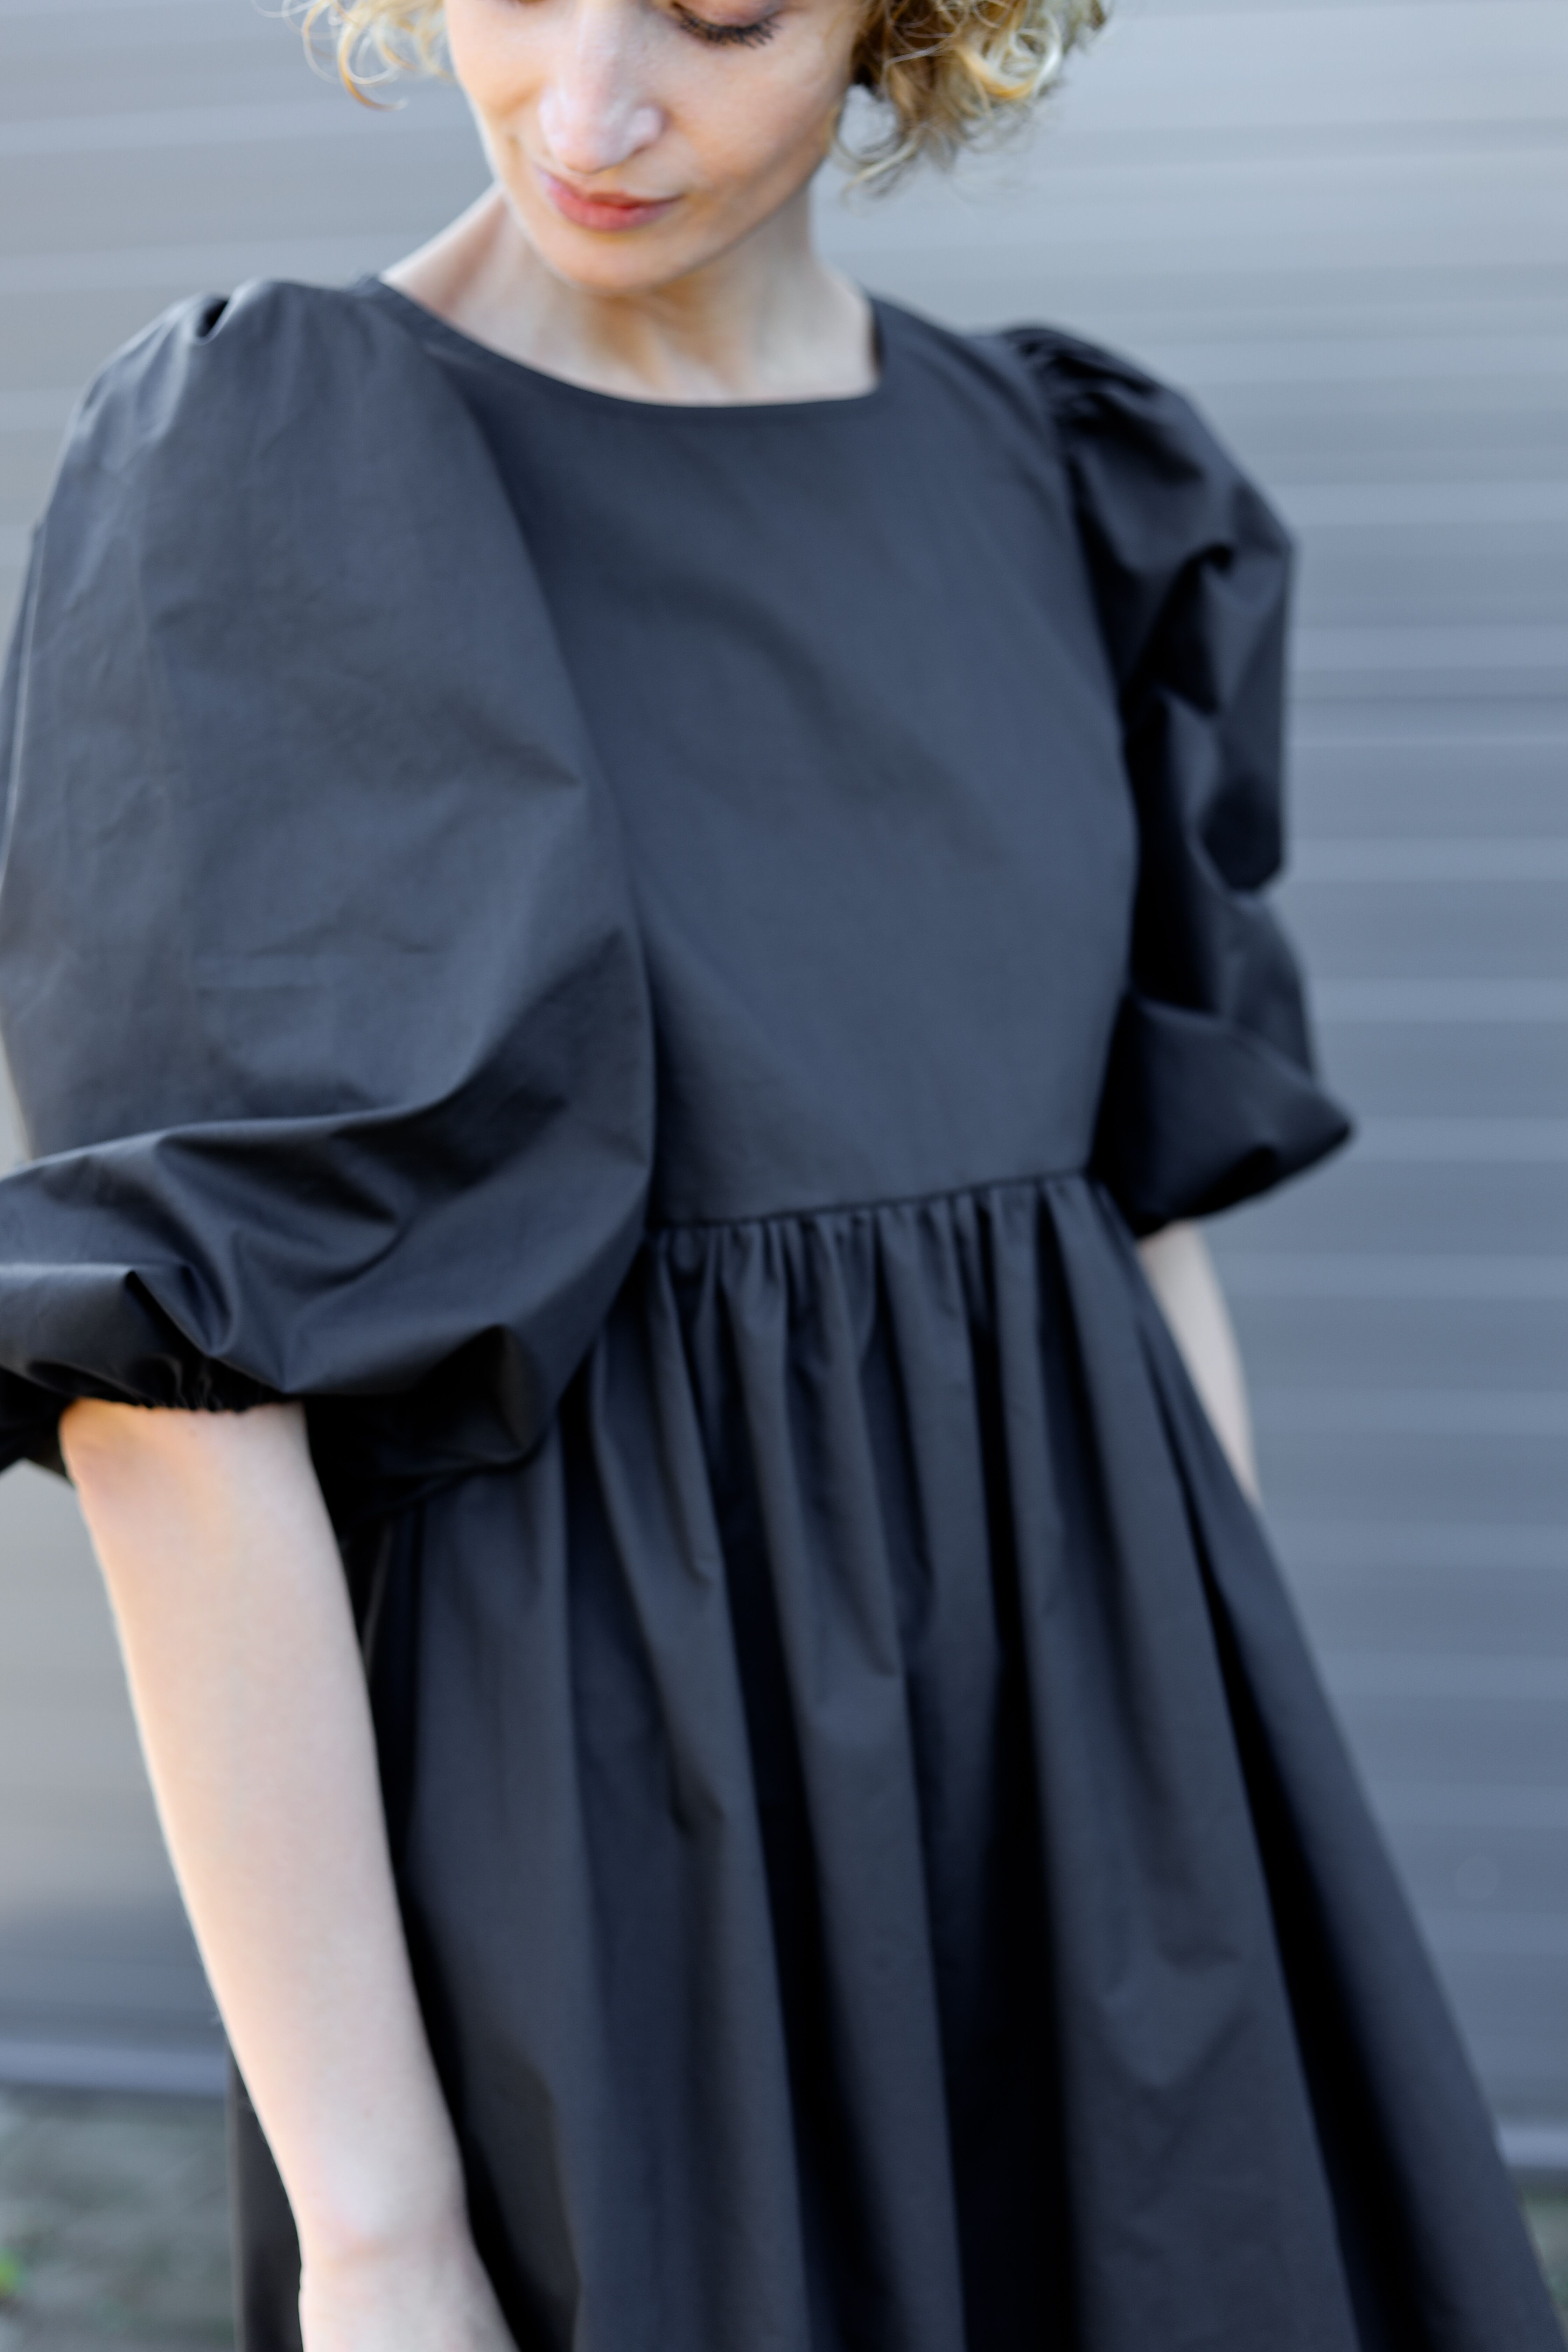 Balloon Sleeve Dress Empire Waist Black Cotton Poplin Dress Etsy In 2021 Minimal Dress Dresses With Sleeves Balloon Sleeve Dress [ 6720 x 4480 Pixel ]